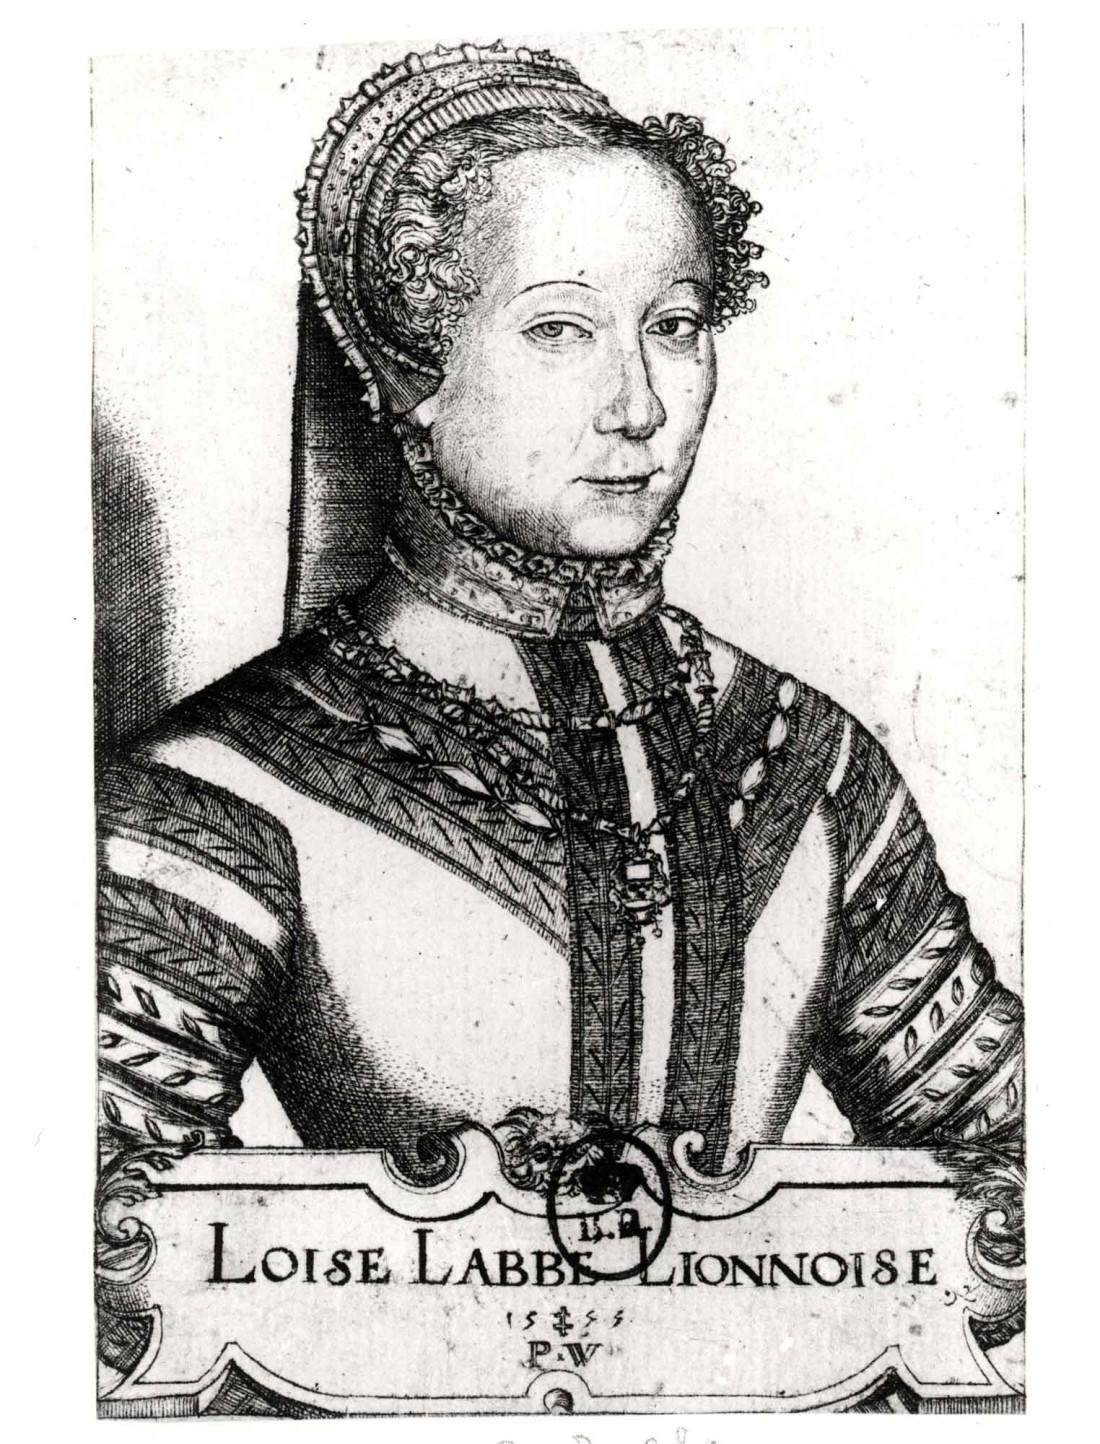 Louise Labe-edith